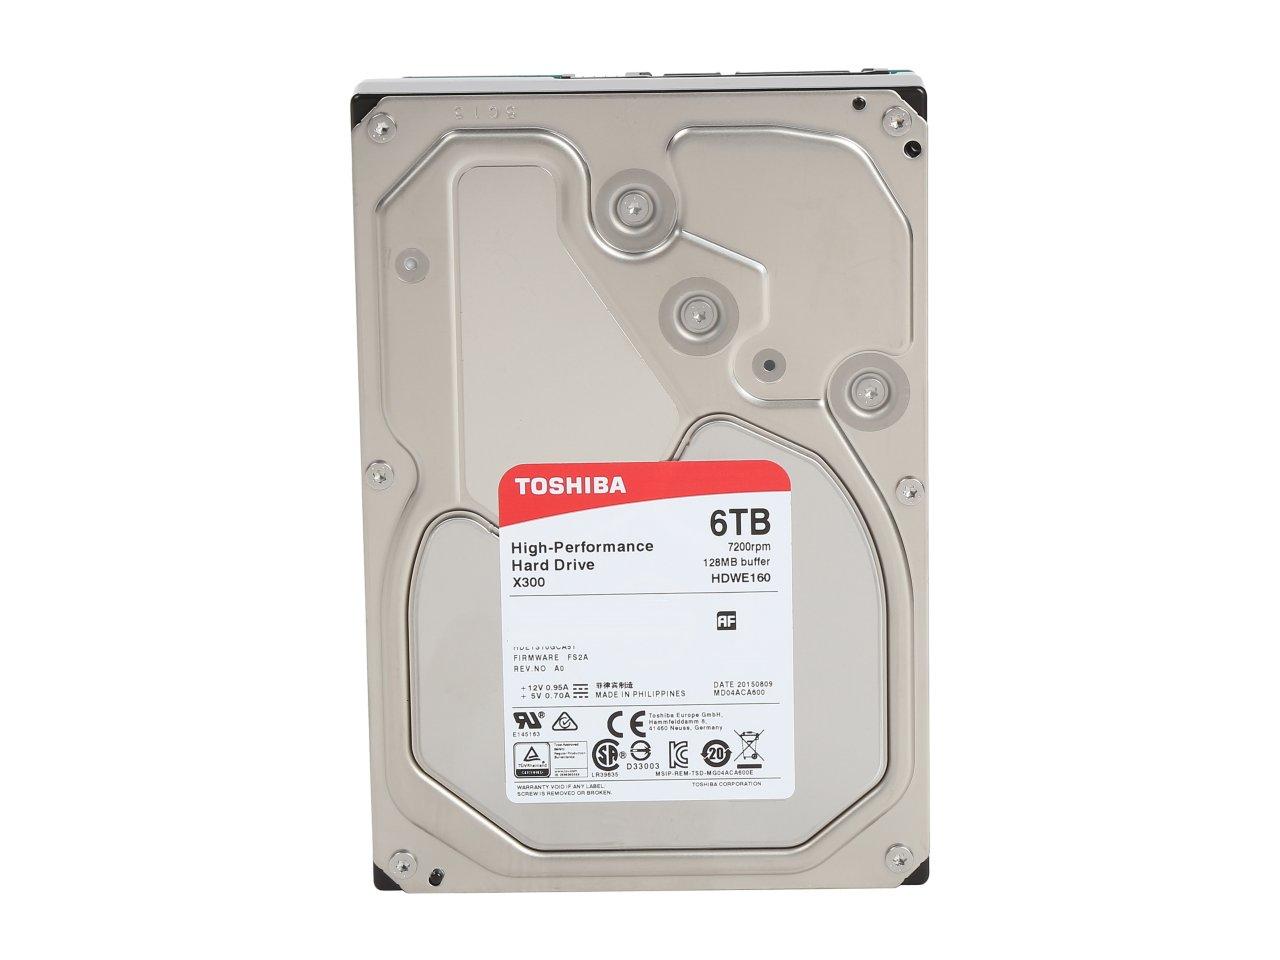 "6 TB Toshiba X300 3.5"" 7200 RPM SATA III Internal Hard Drive Retail Kit for $174.99 AC, 240 GB ADATA Premier SP550 2.5"" SATA III TLC Internal SSD for $58.99 & More @ Newegg.com"